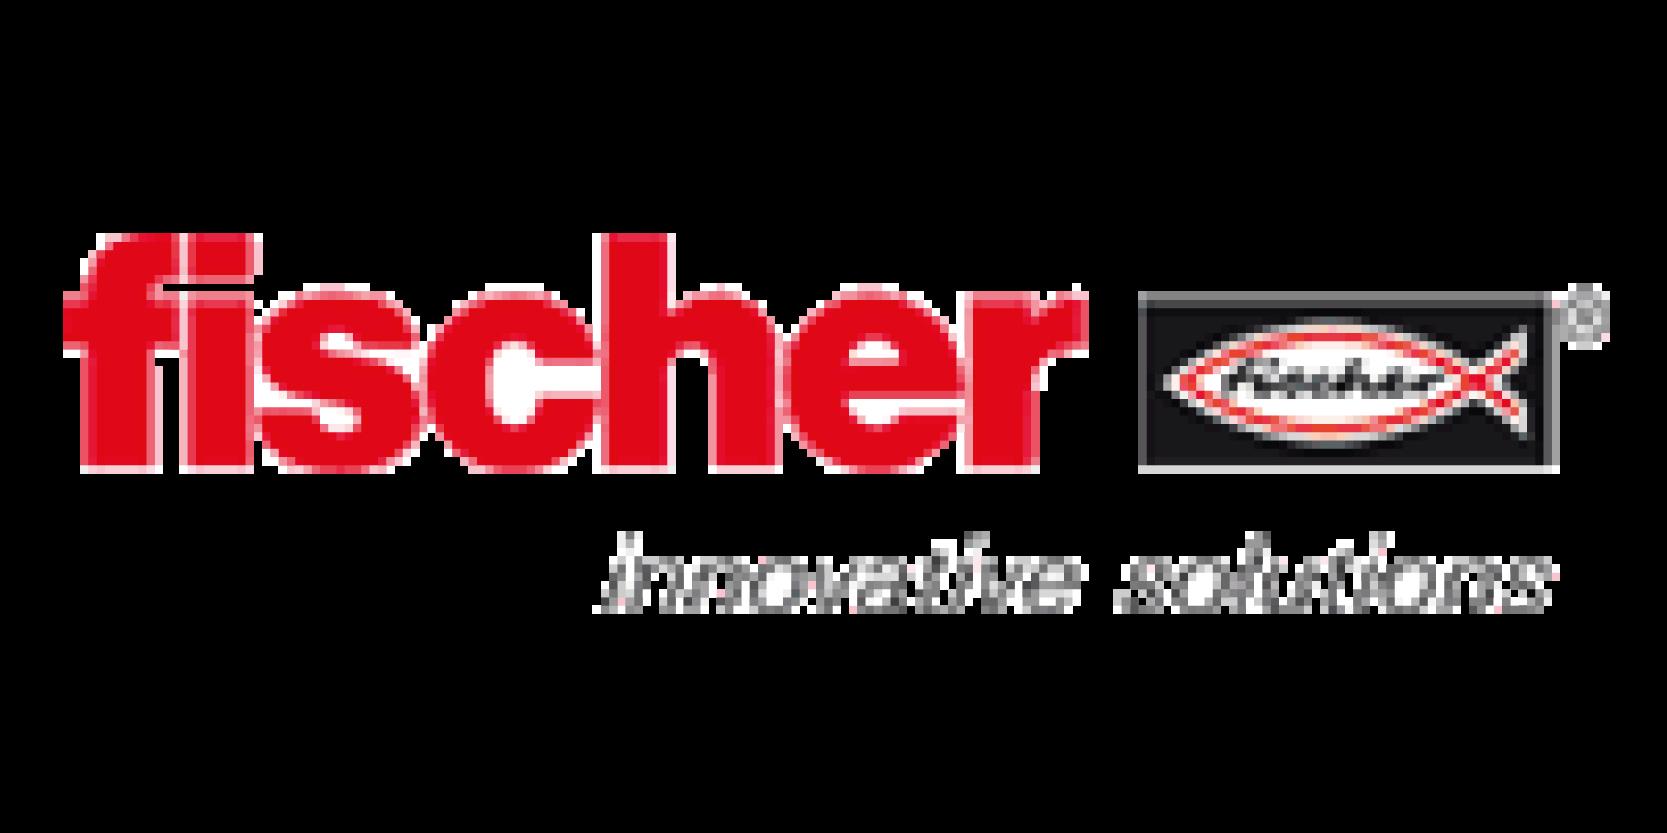 aswsauer-hersteller-logos-07